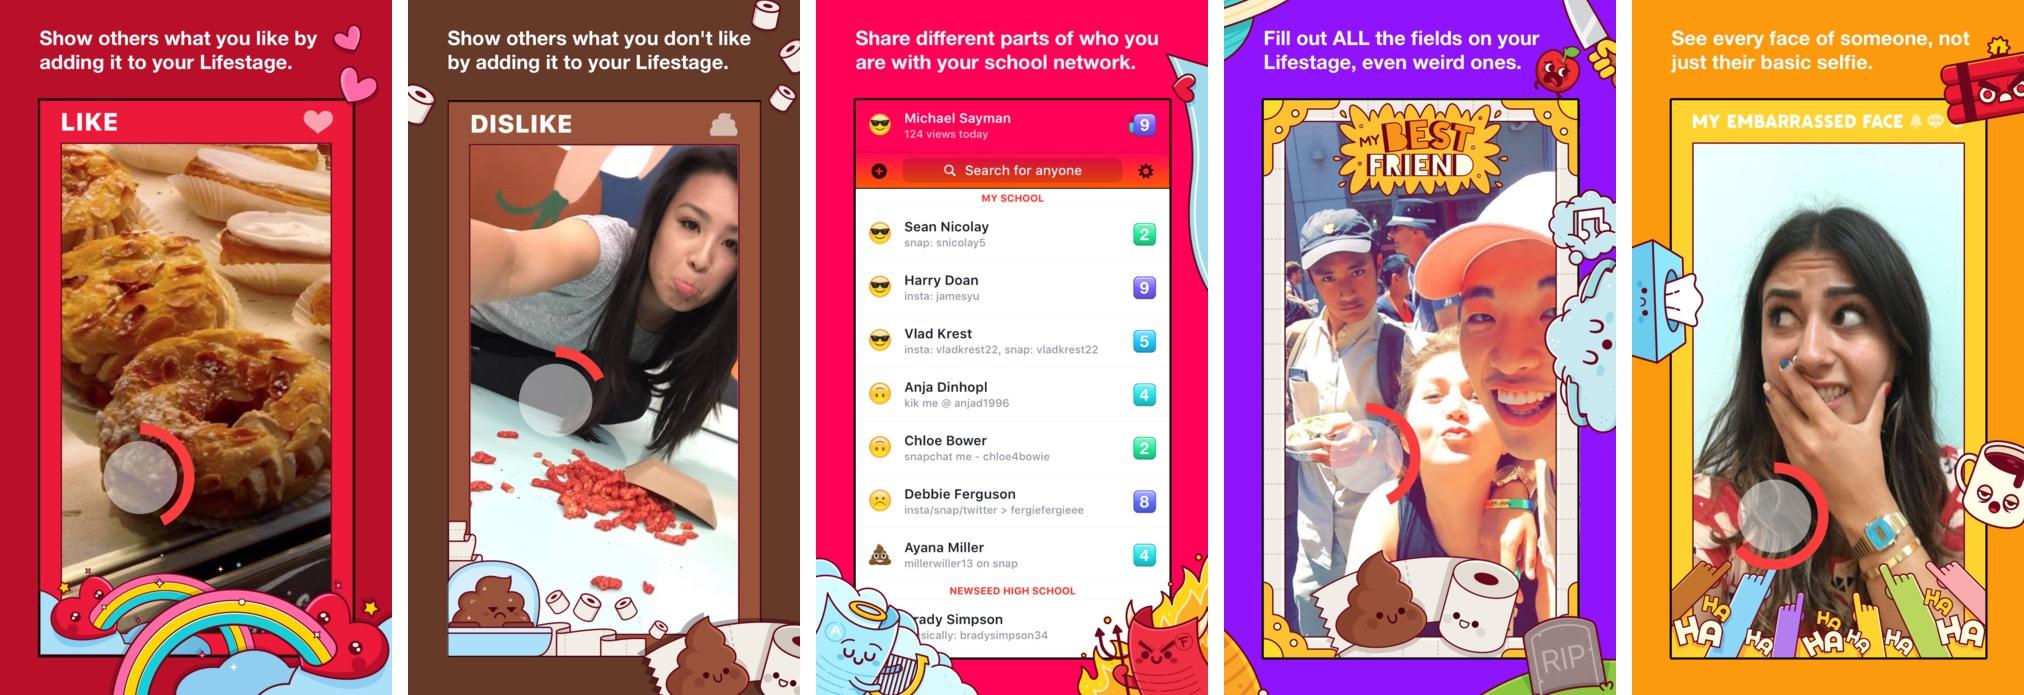 Facebook Lifestage 1.0 for iOS iPhone screenshot 001